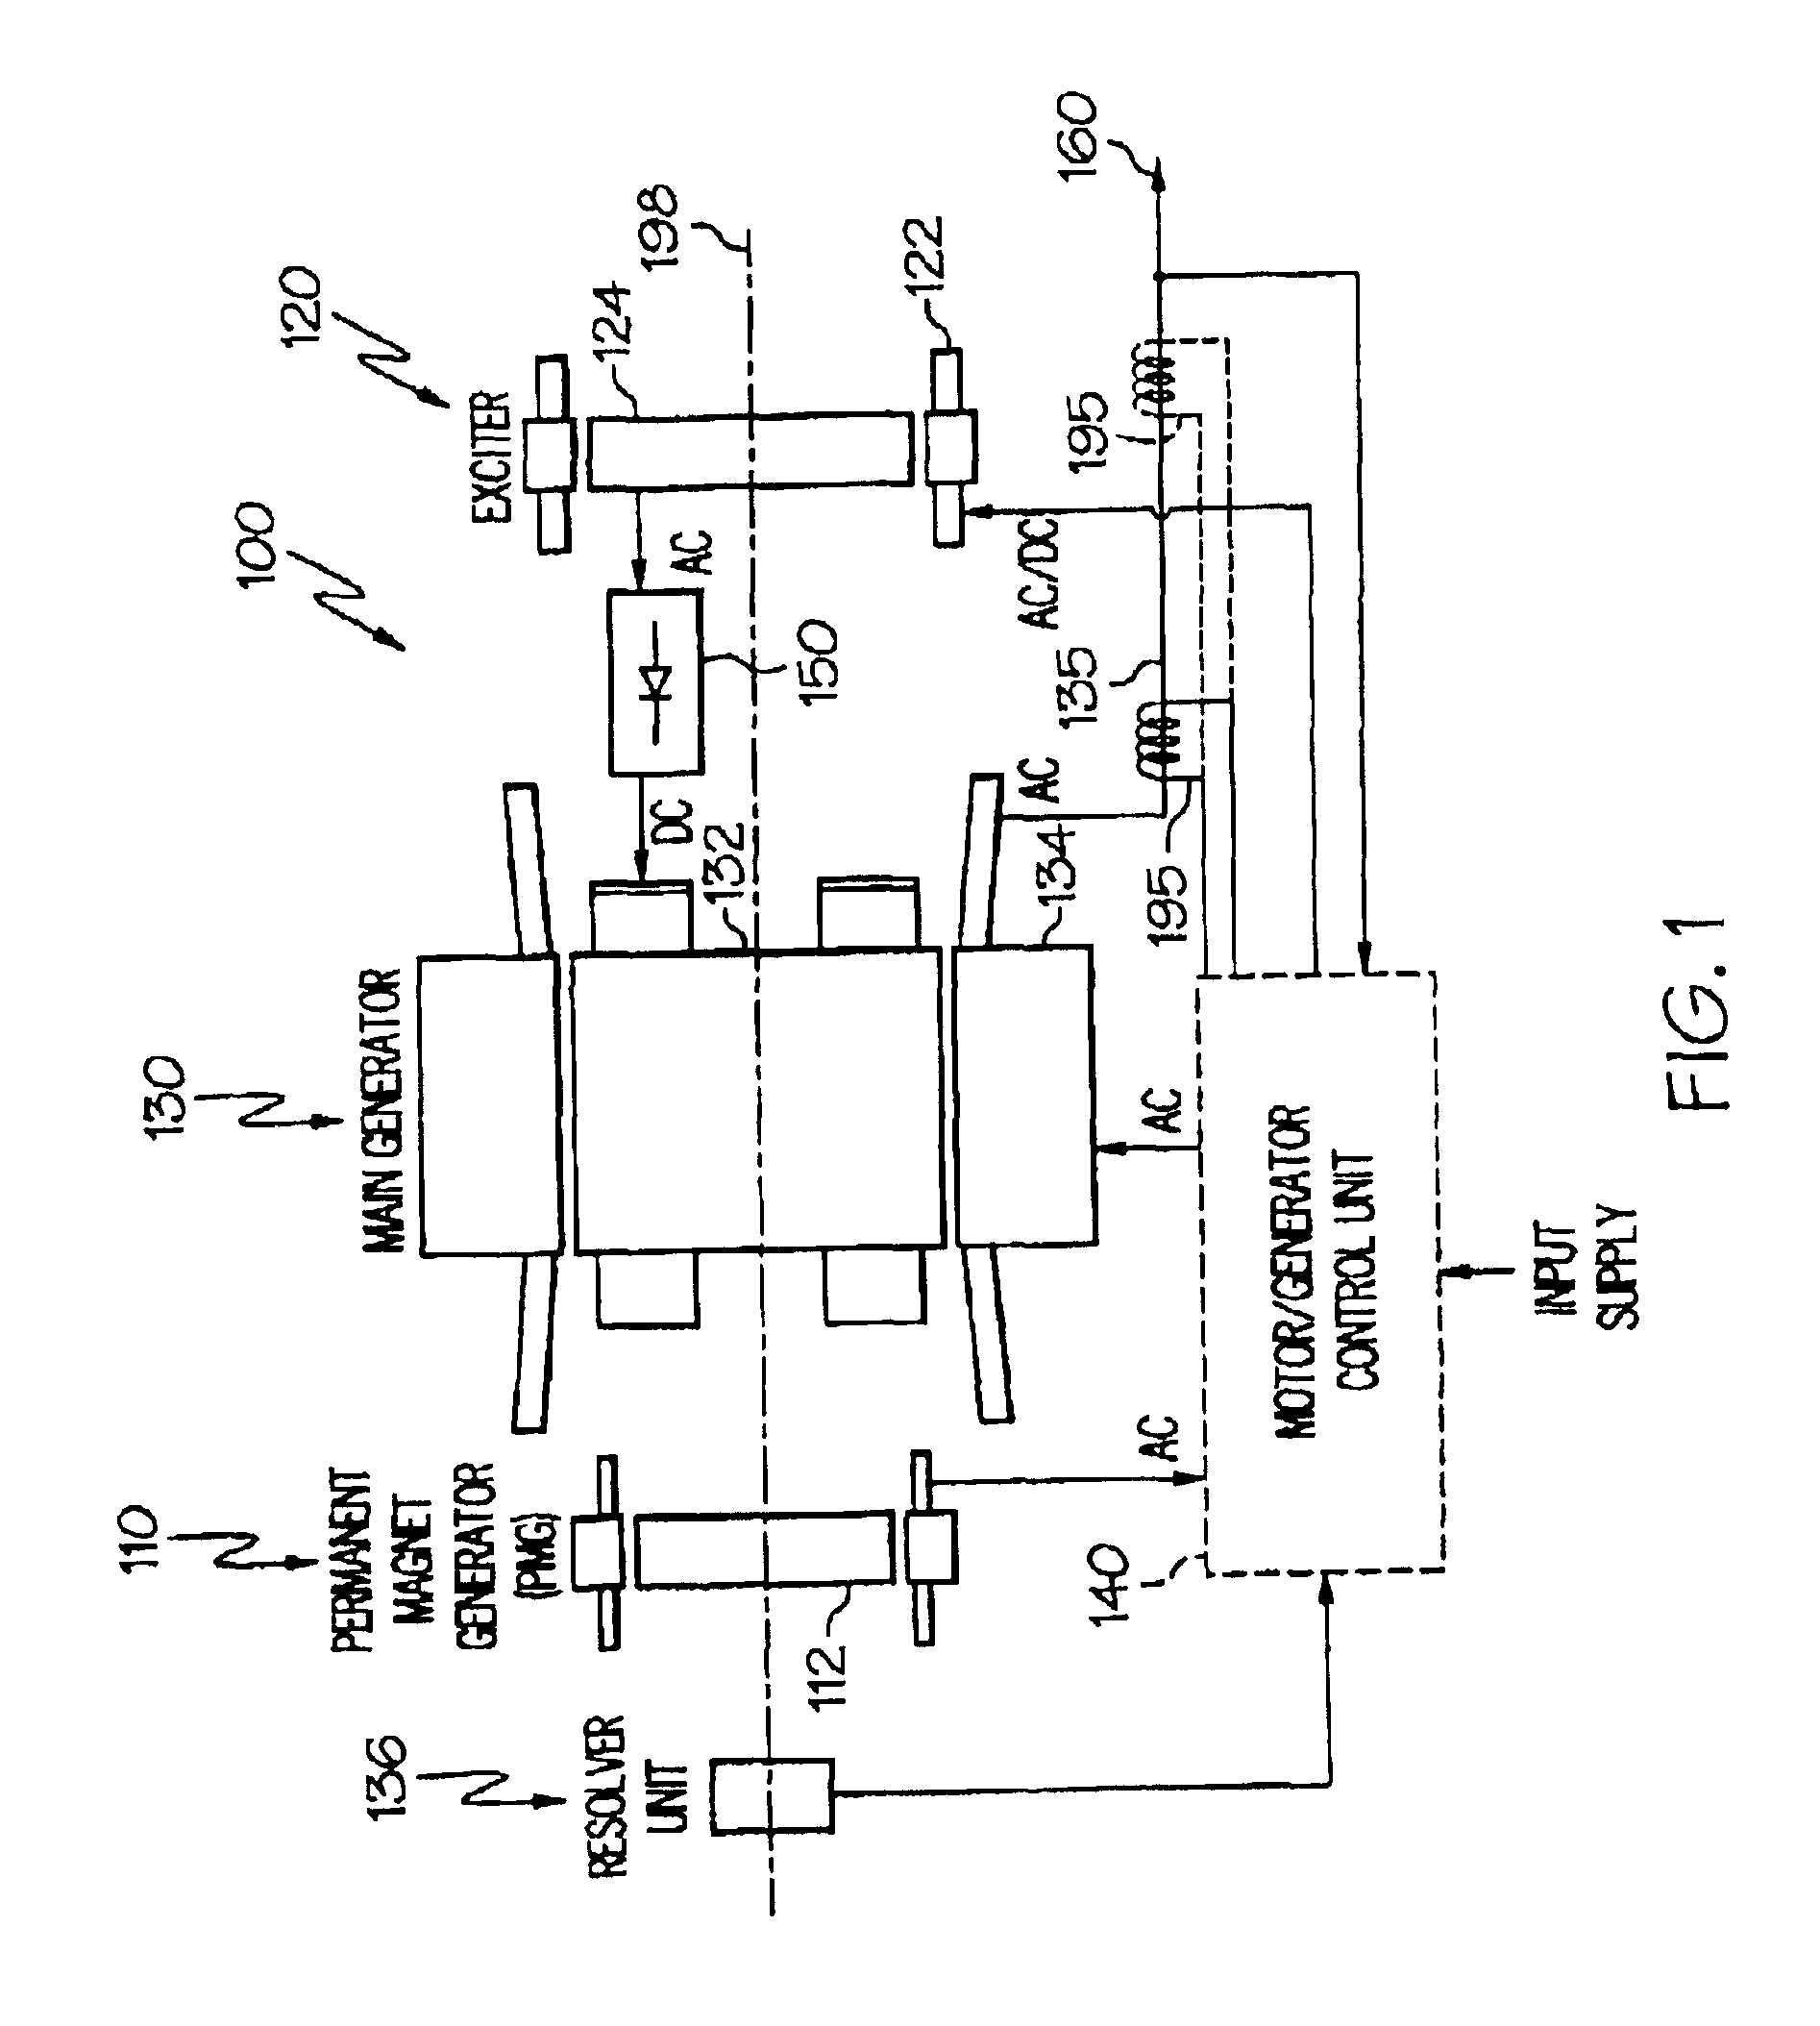 Stupendous Delco Electric Motor Wiring Diagram Wiring Diagram Wiring Cloud Xortanetembamohammedshrineorg